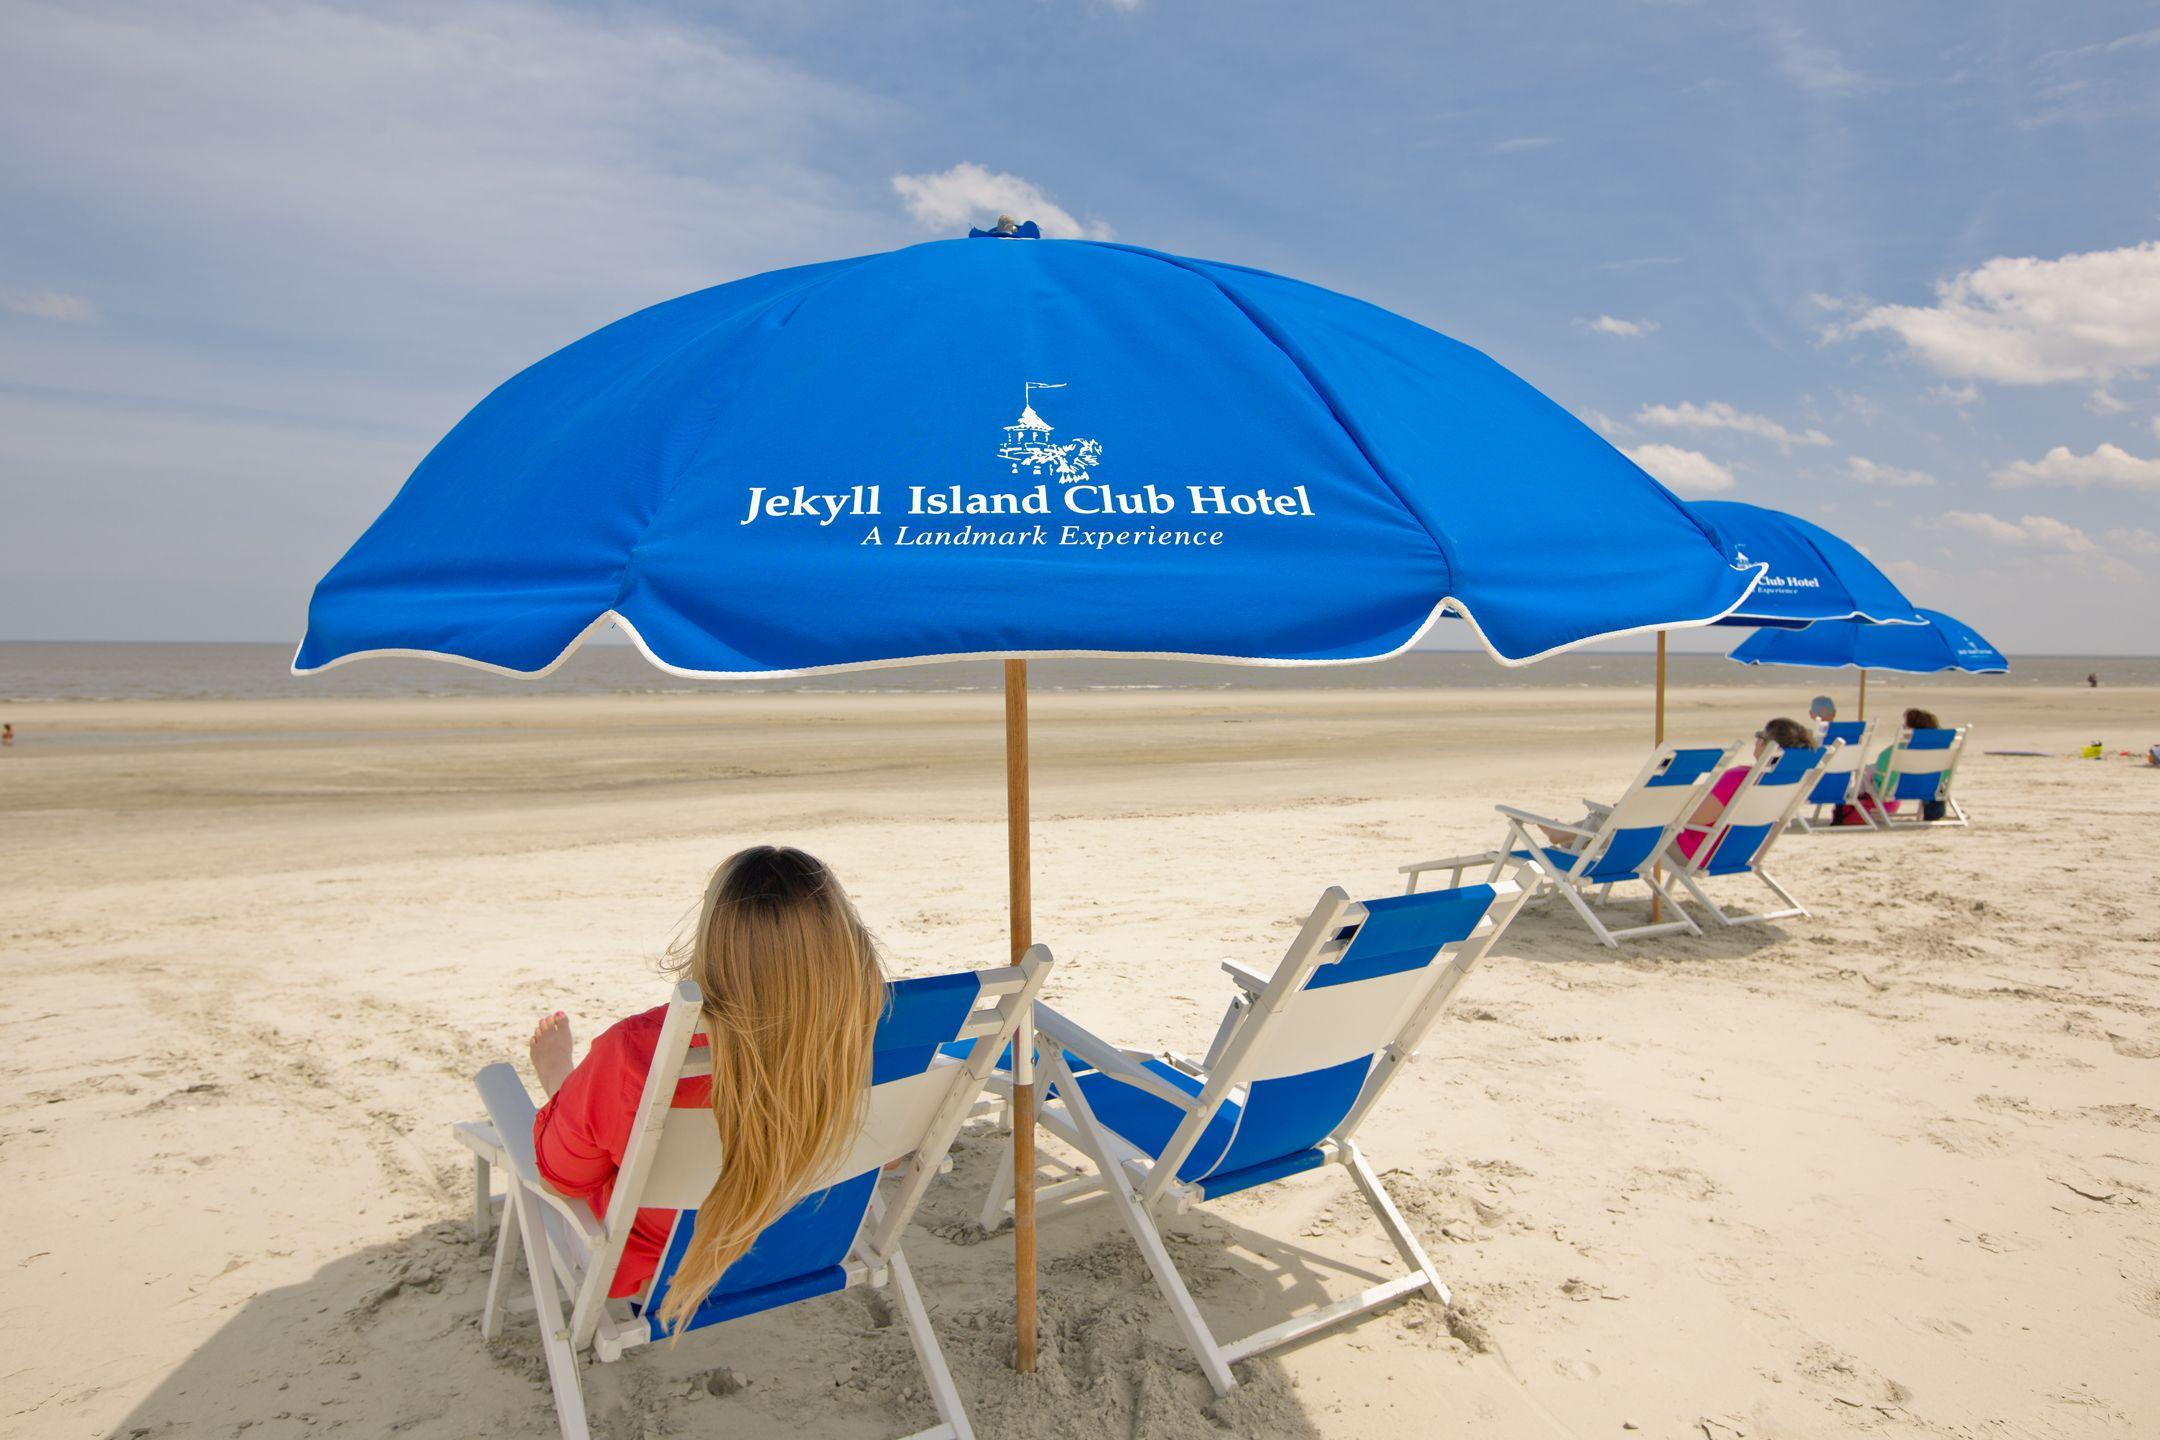 Beachside is the best side myjichgetaway jekyll island